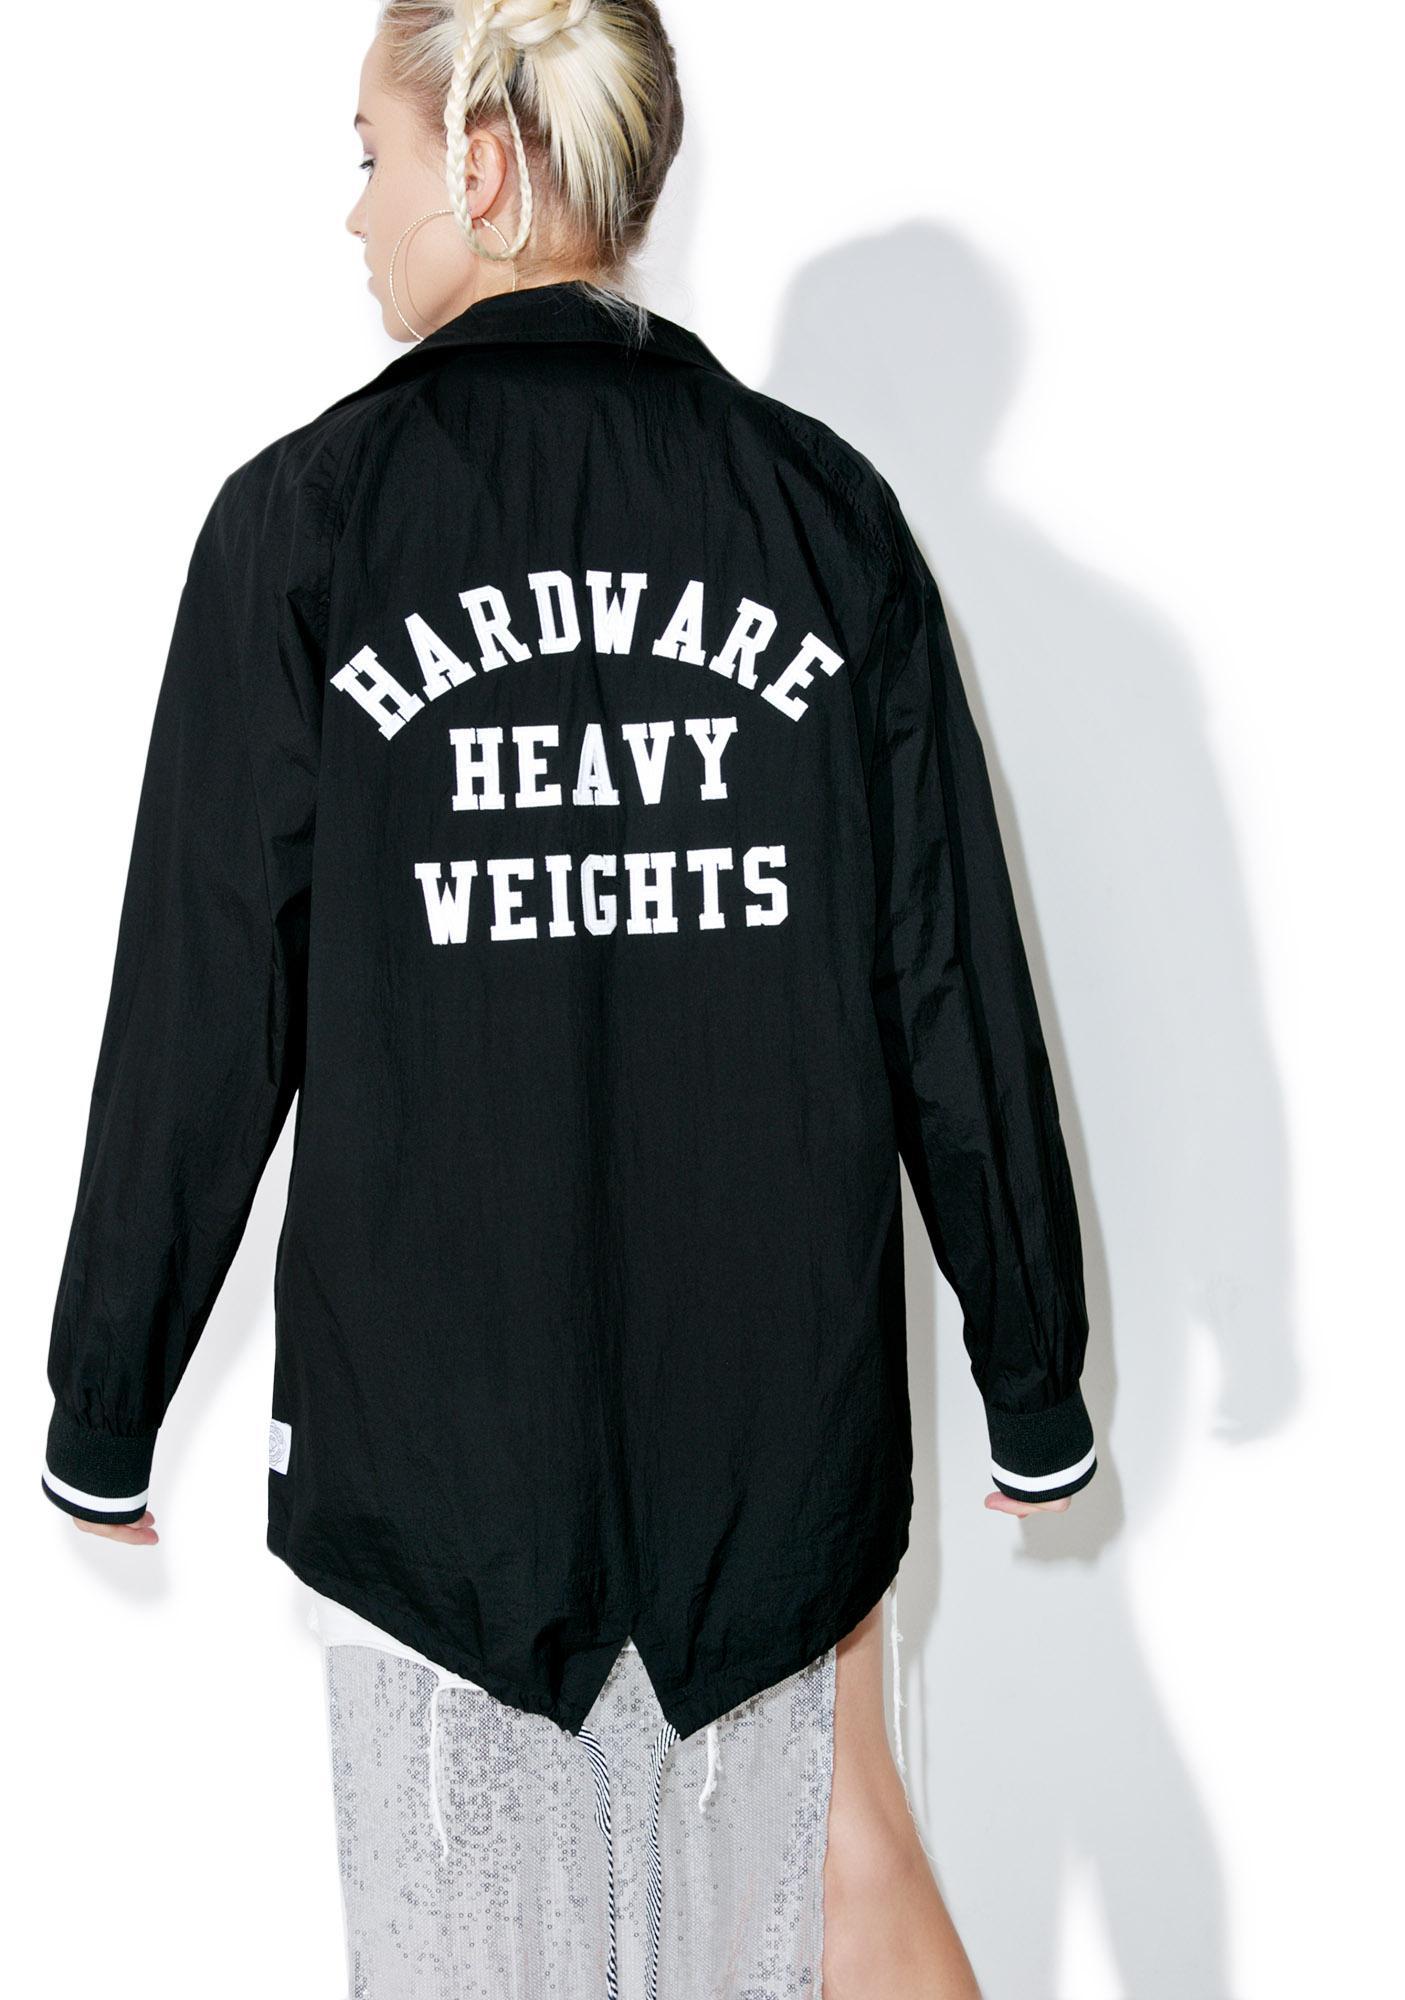 Diamond Supply Heavyweights Coaches Jacket